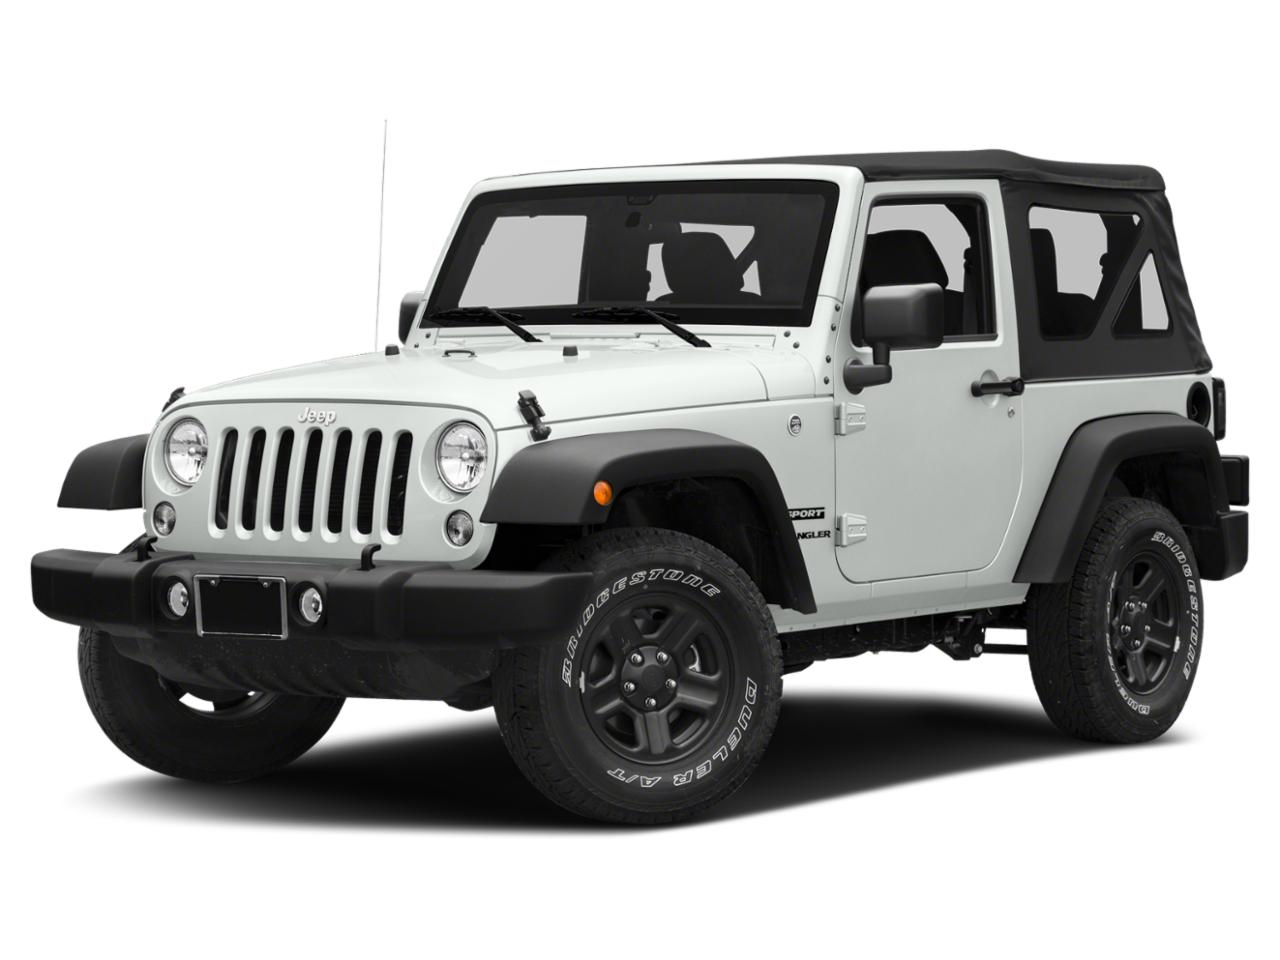 2017 Jeep Wrangler Vehicle Photo in NEENAH, WI 54956-2243